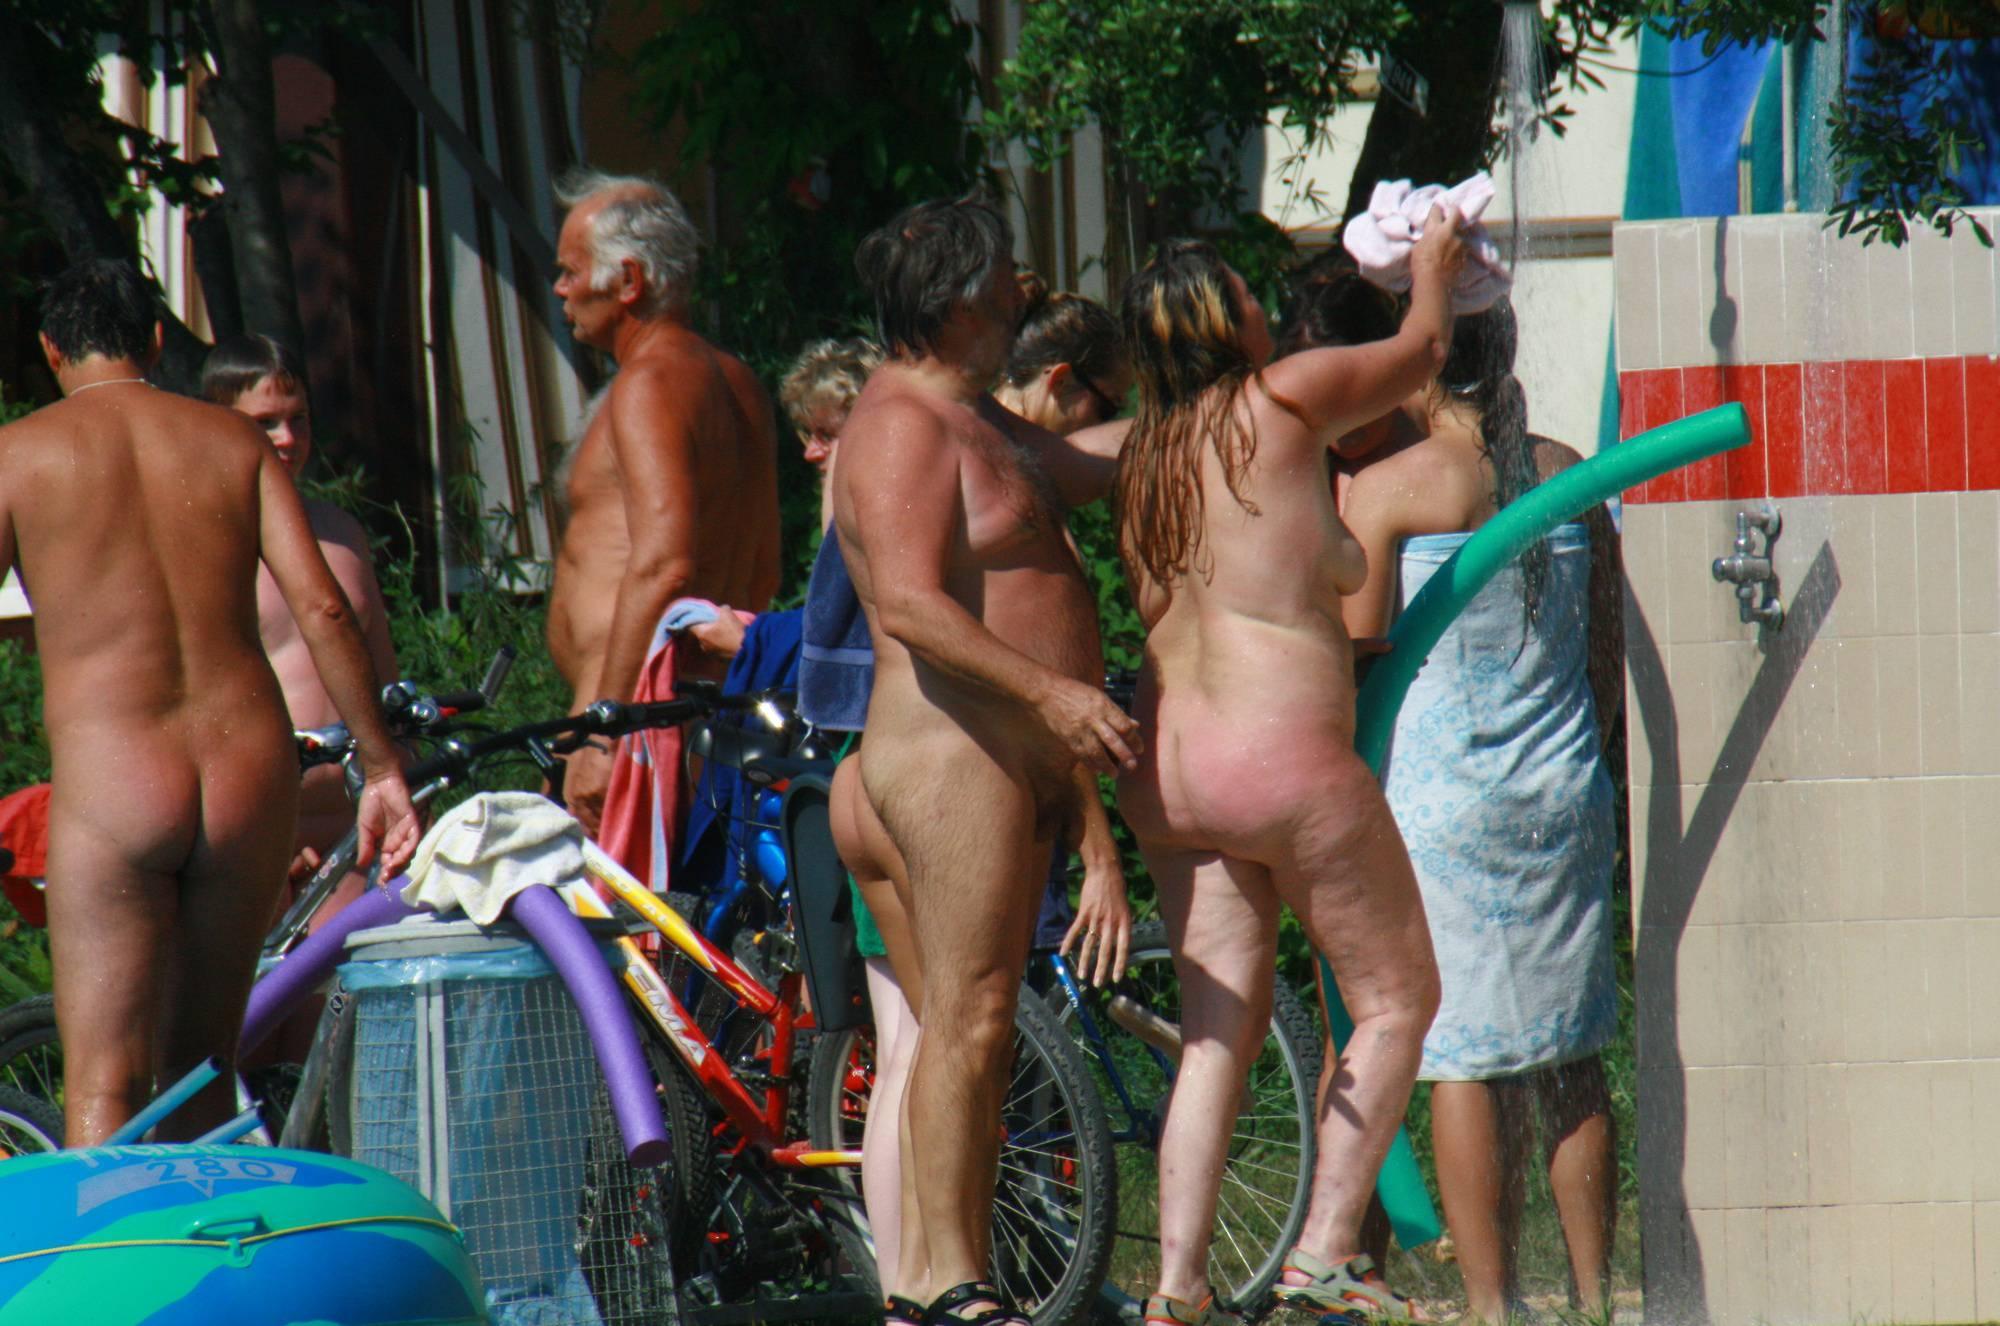 Naturist Outdoor Showers - 3